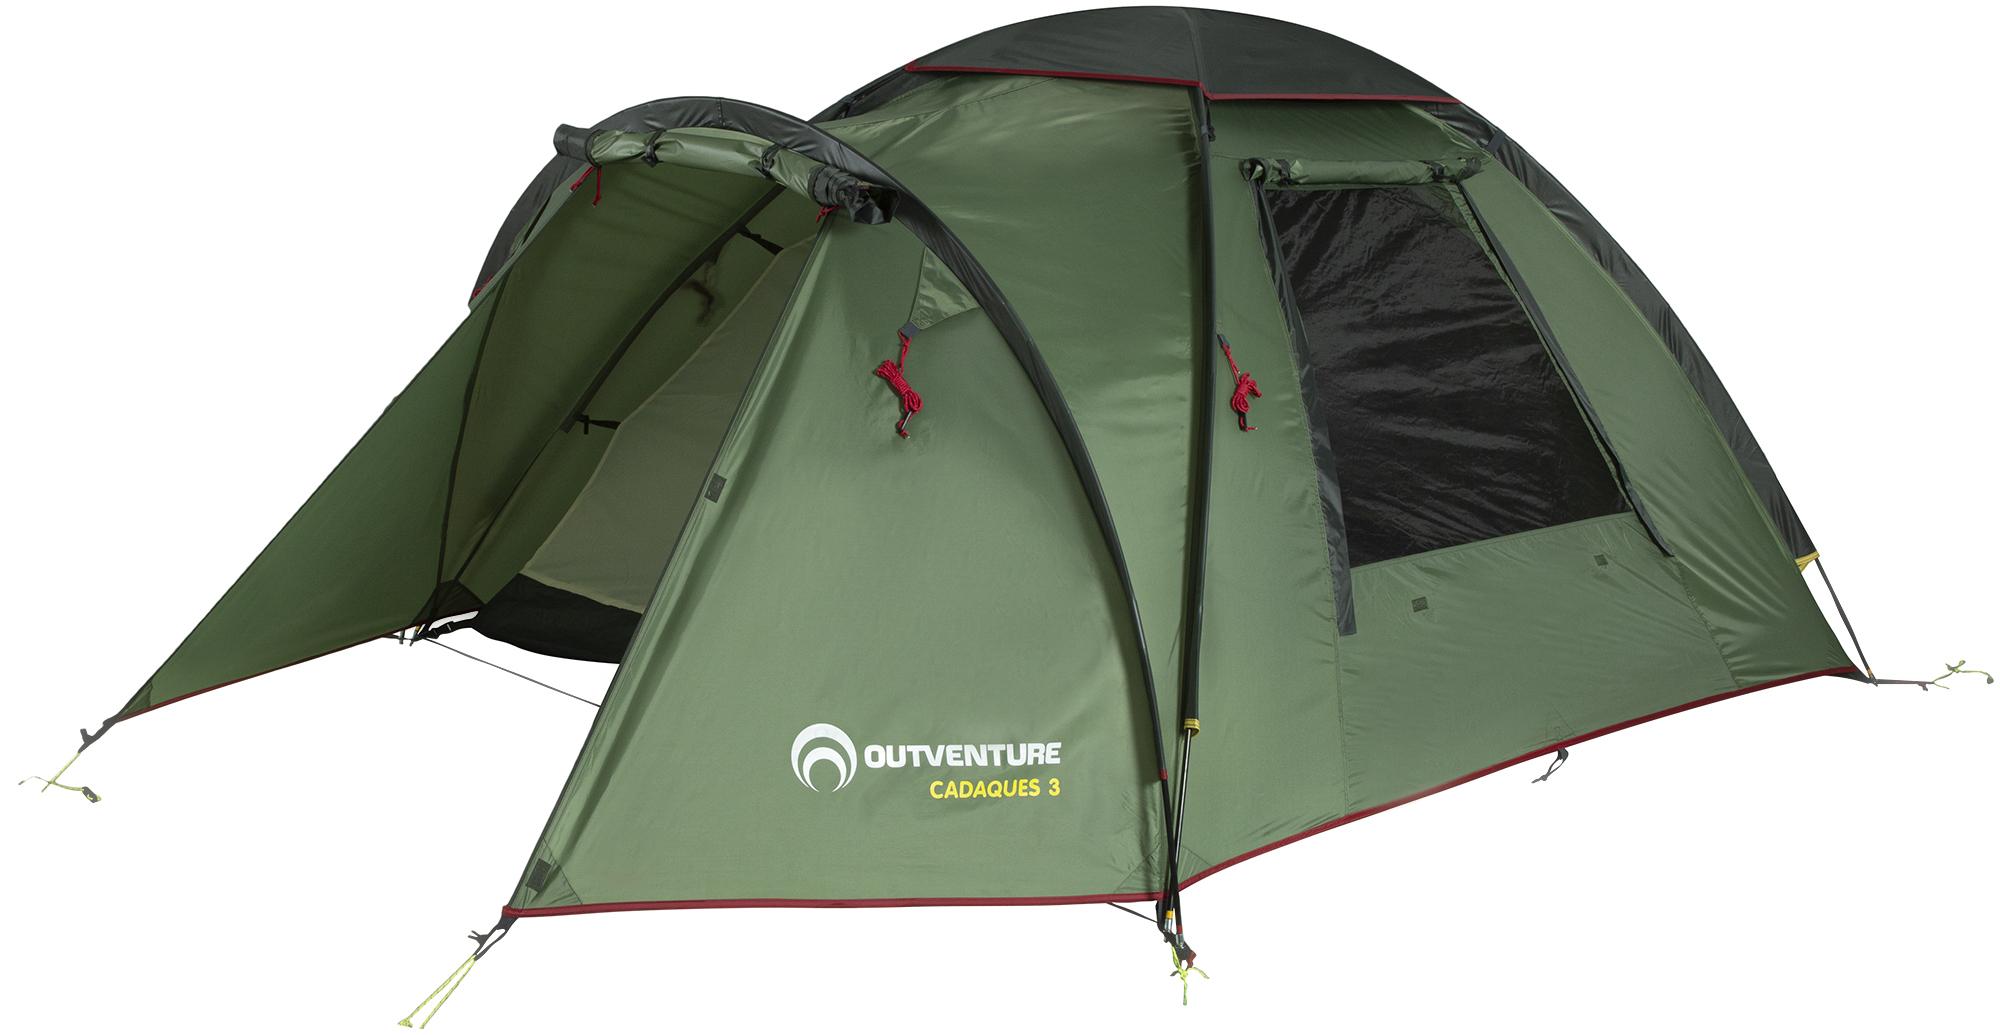 Фото - Outventure CADAQUES 3 палатка greenhouse fct 32 трехместная